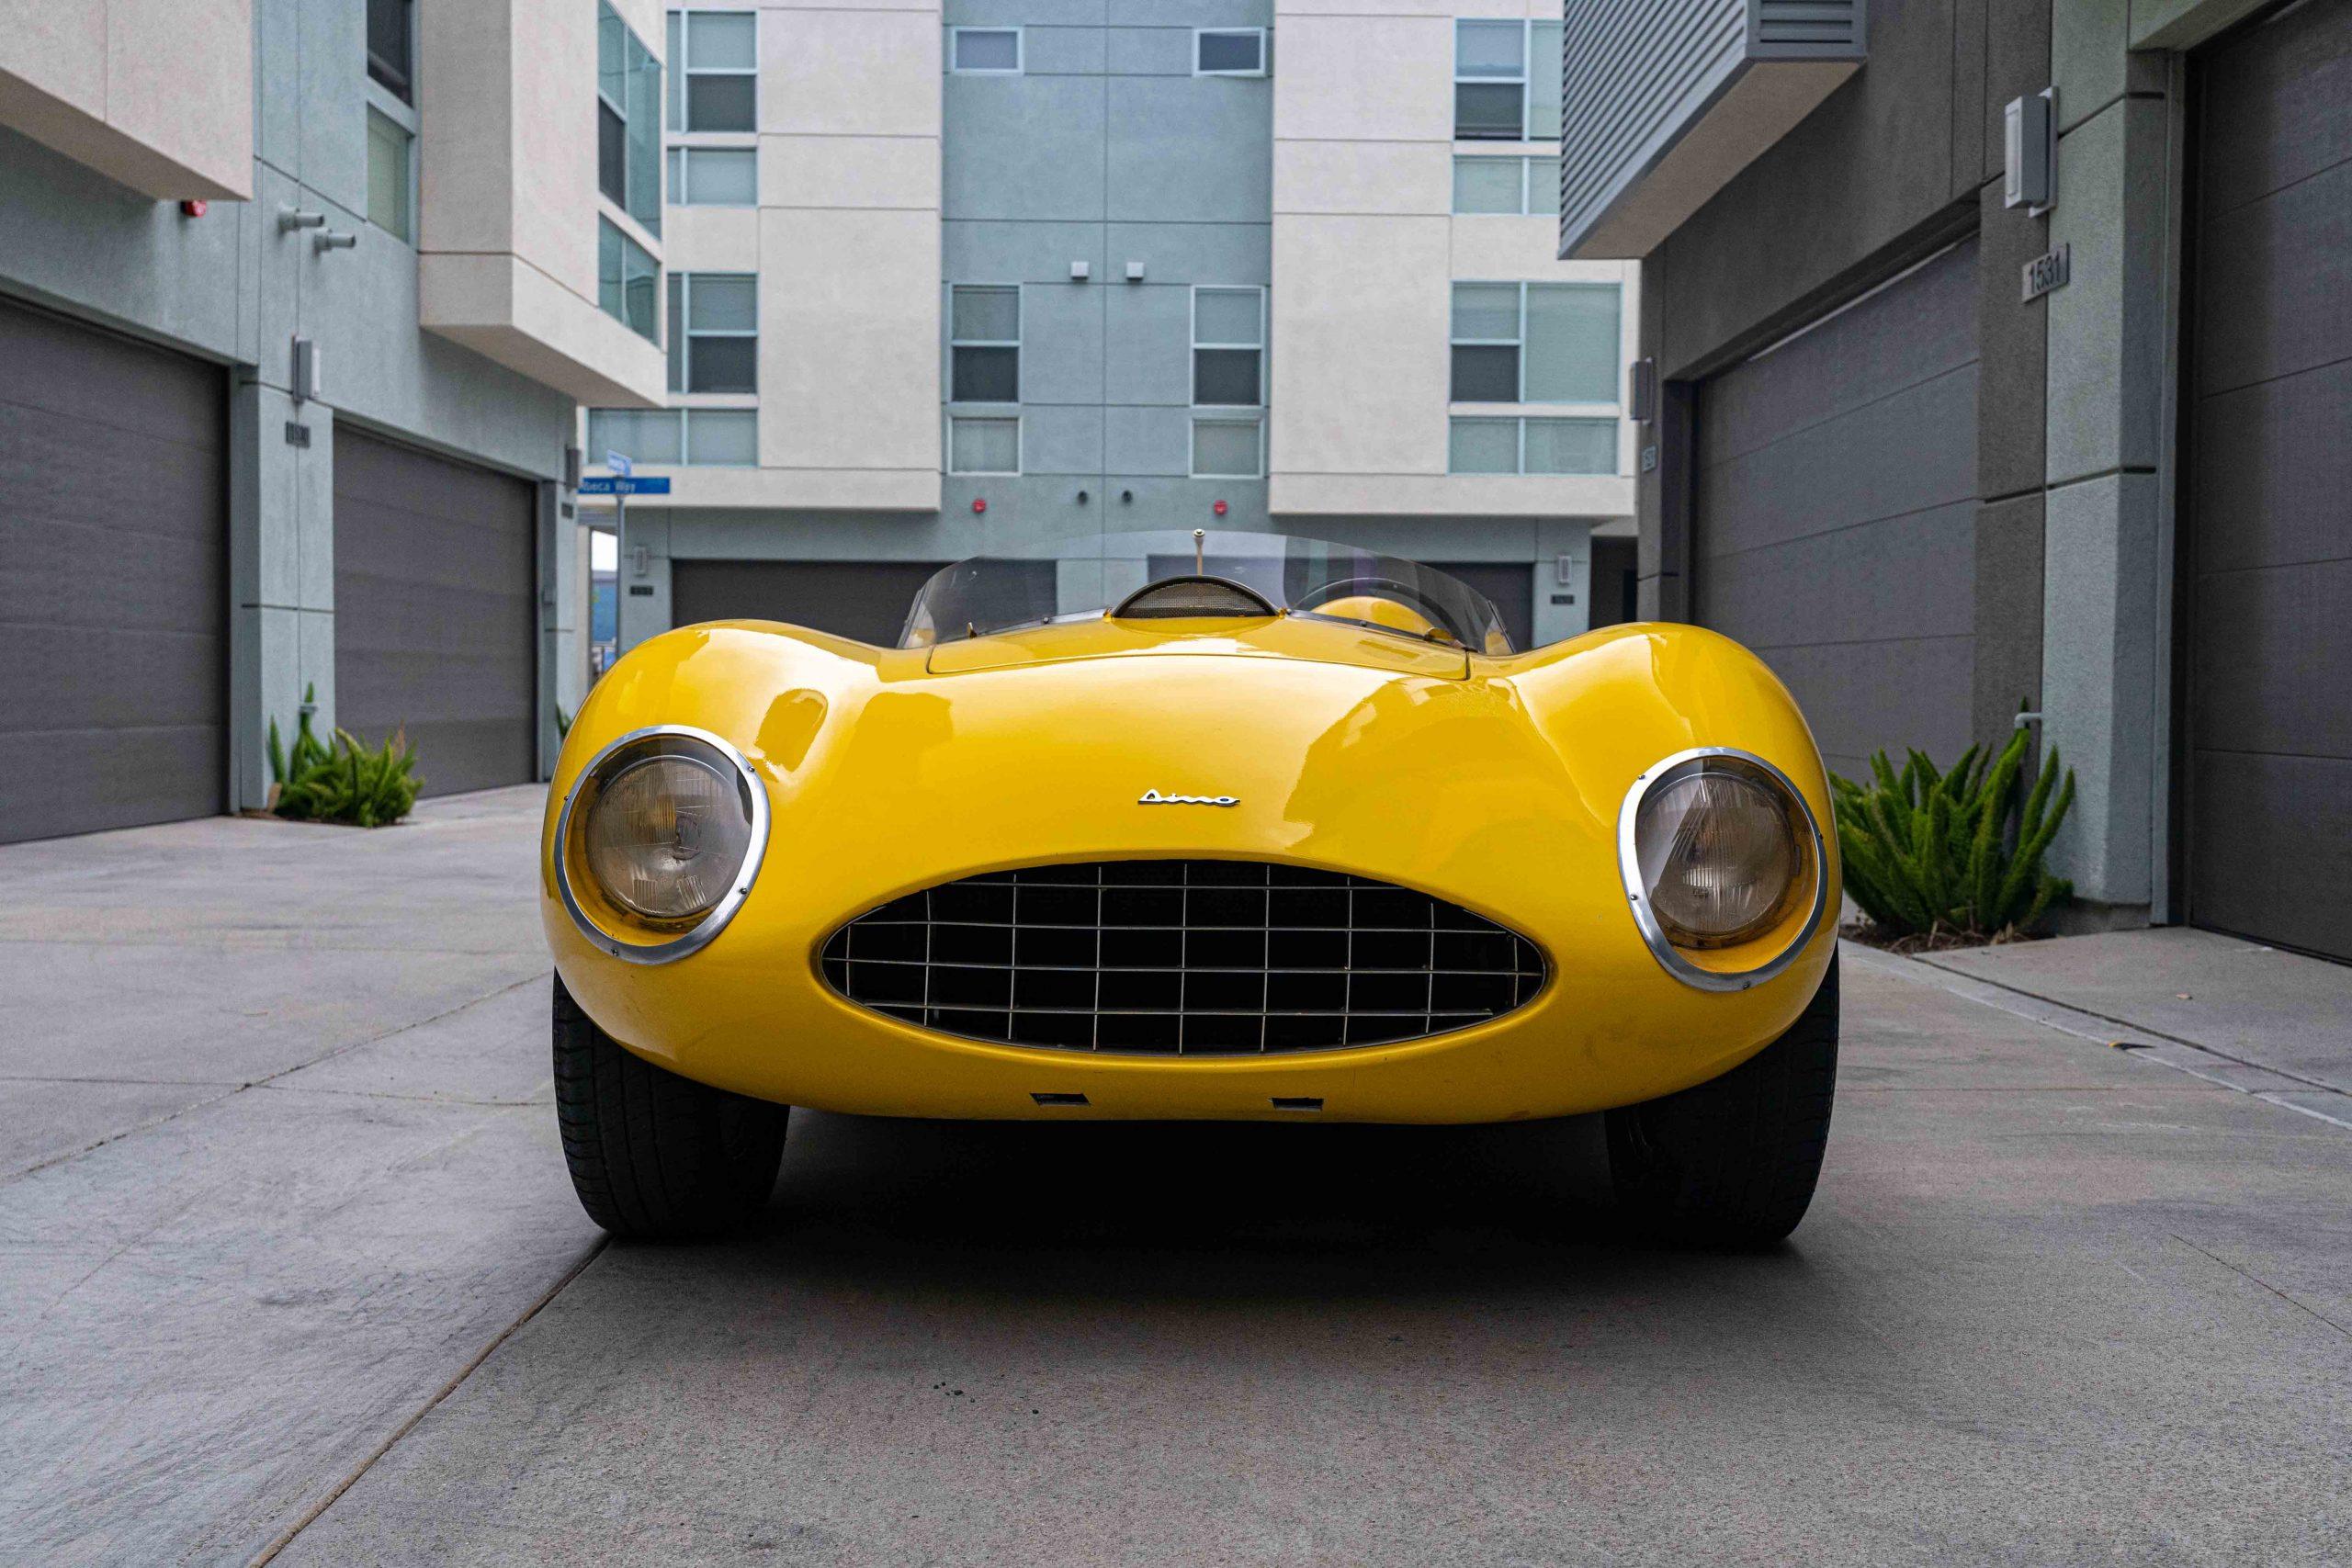 1957 Ferrari 196 SP front nose low